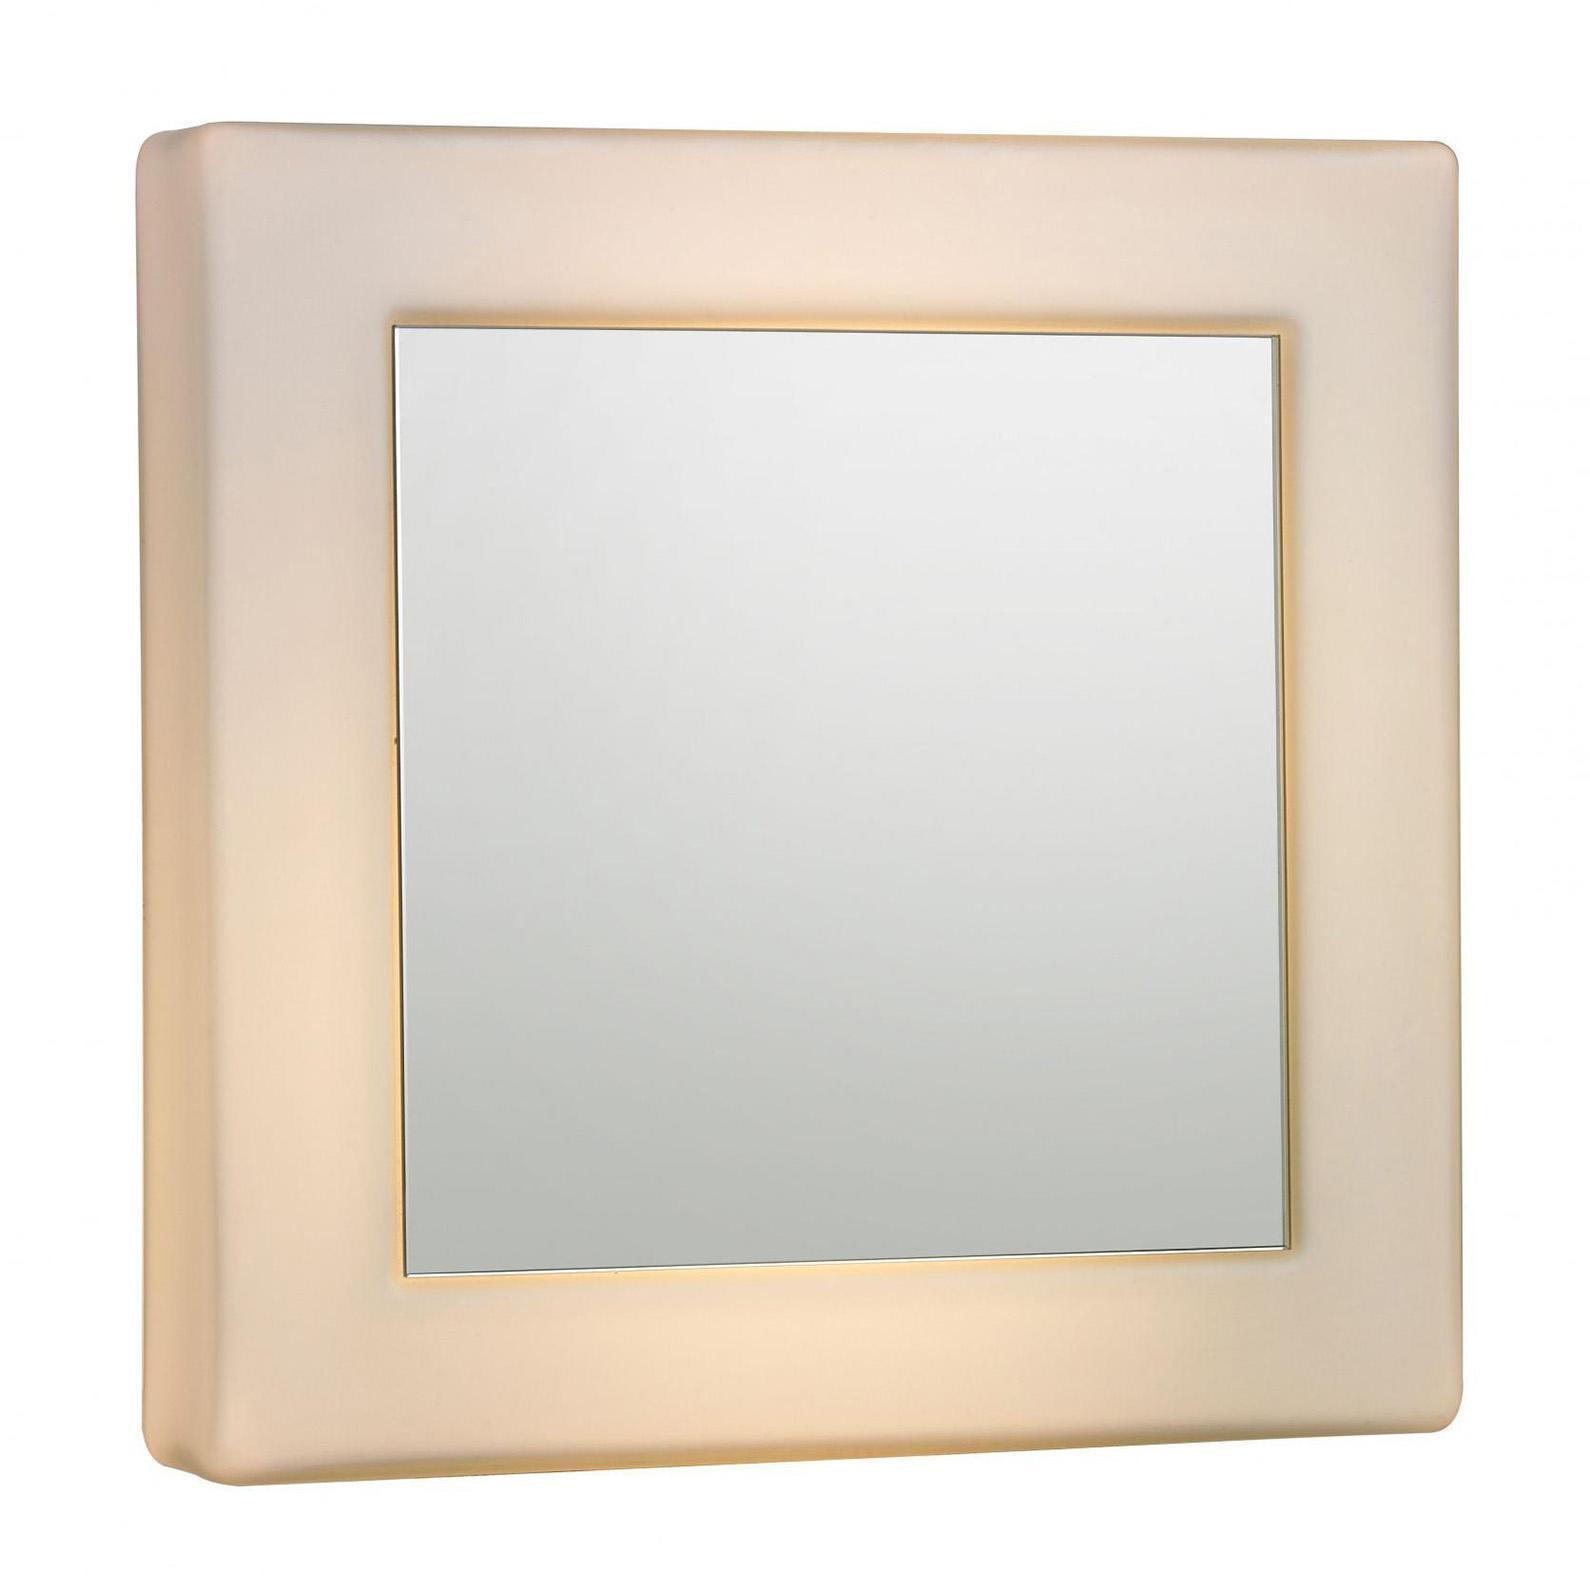 A2444AP-2WH AQUA Встраиваемый светильникA2444AP-2WHA2444AP-2WH AQUA Встраиваемый светильник 2xE27 60WМатериал: Арматура: Металл / Плафон: СтеклоЦвет: Арматура: БелыйРазмер: 31x31x9